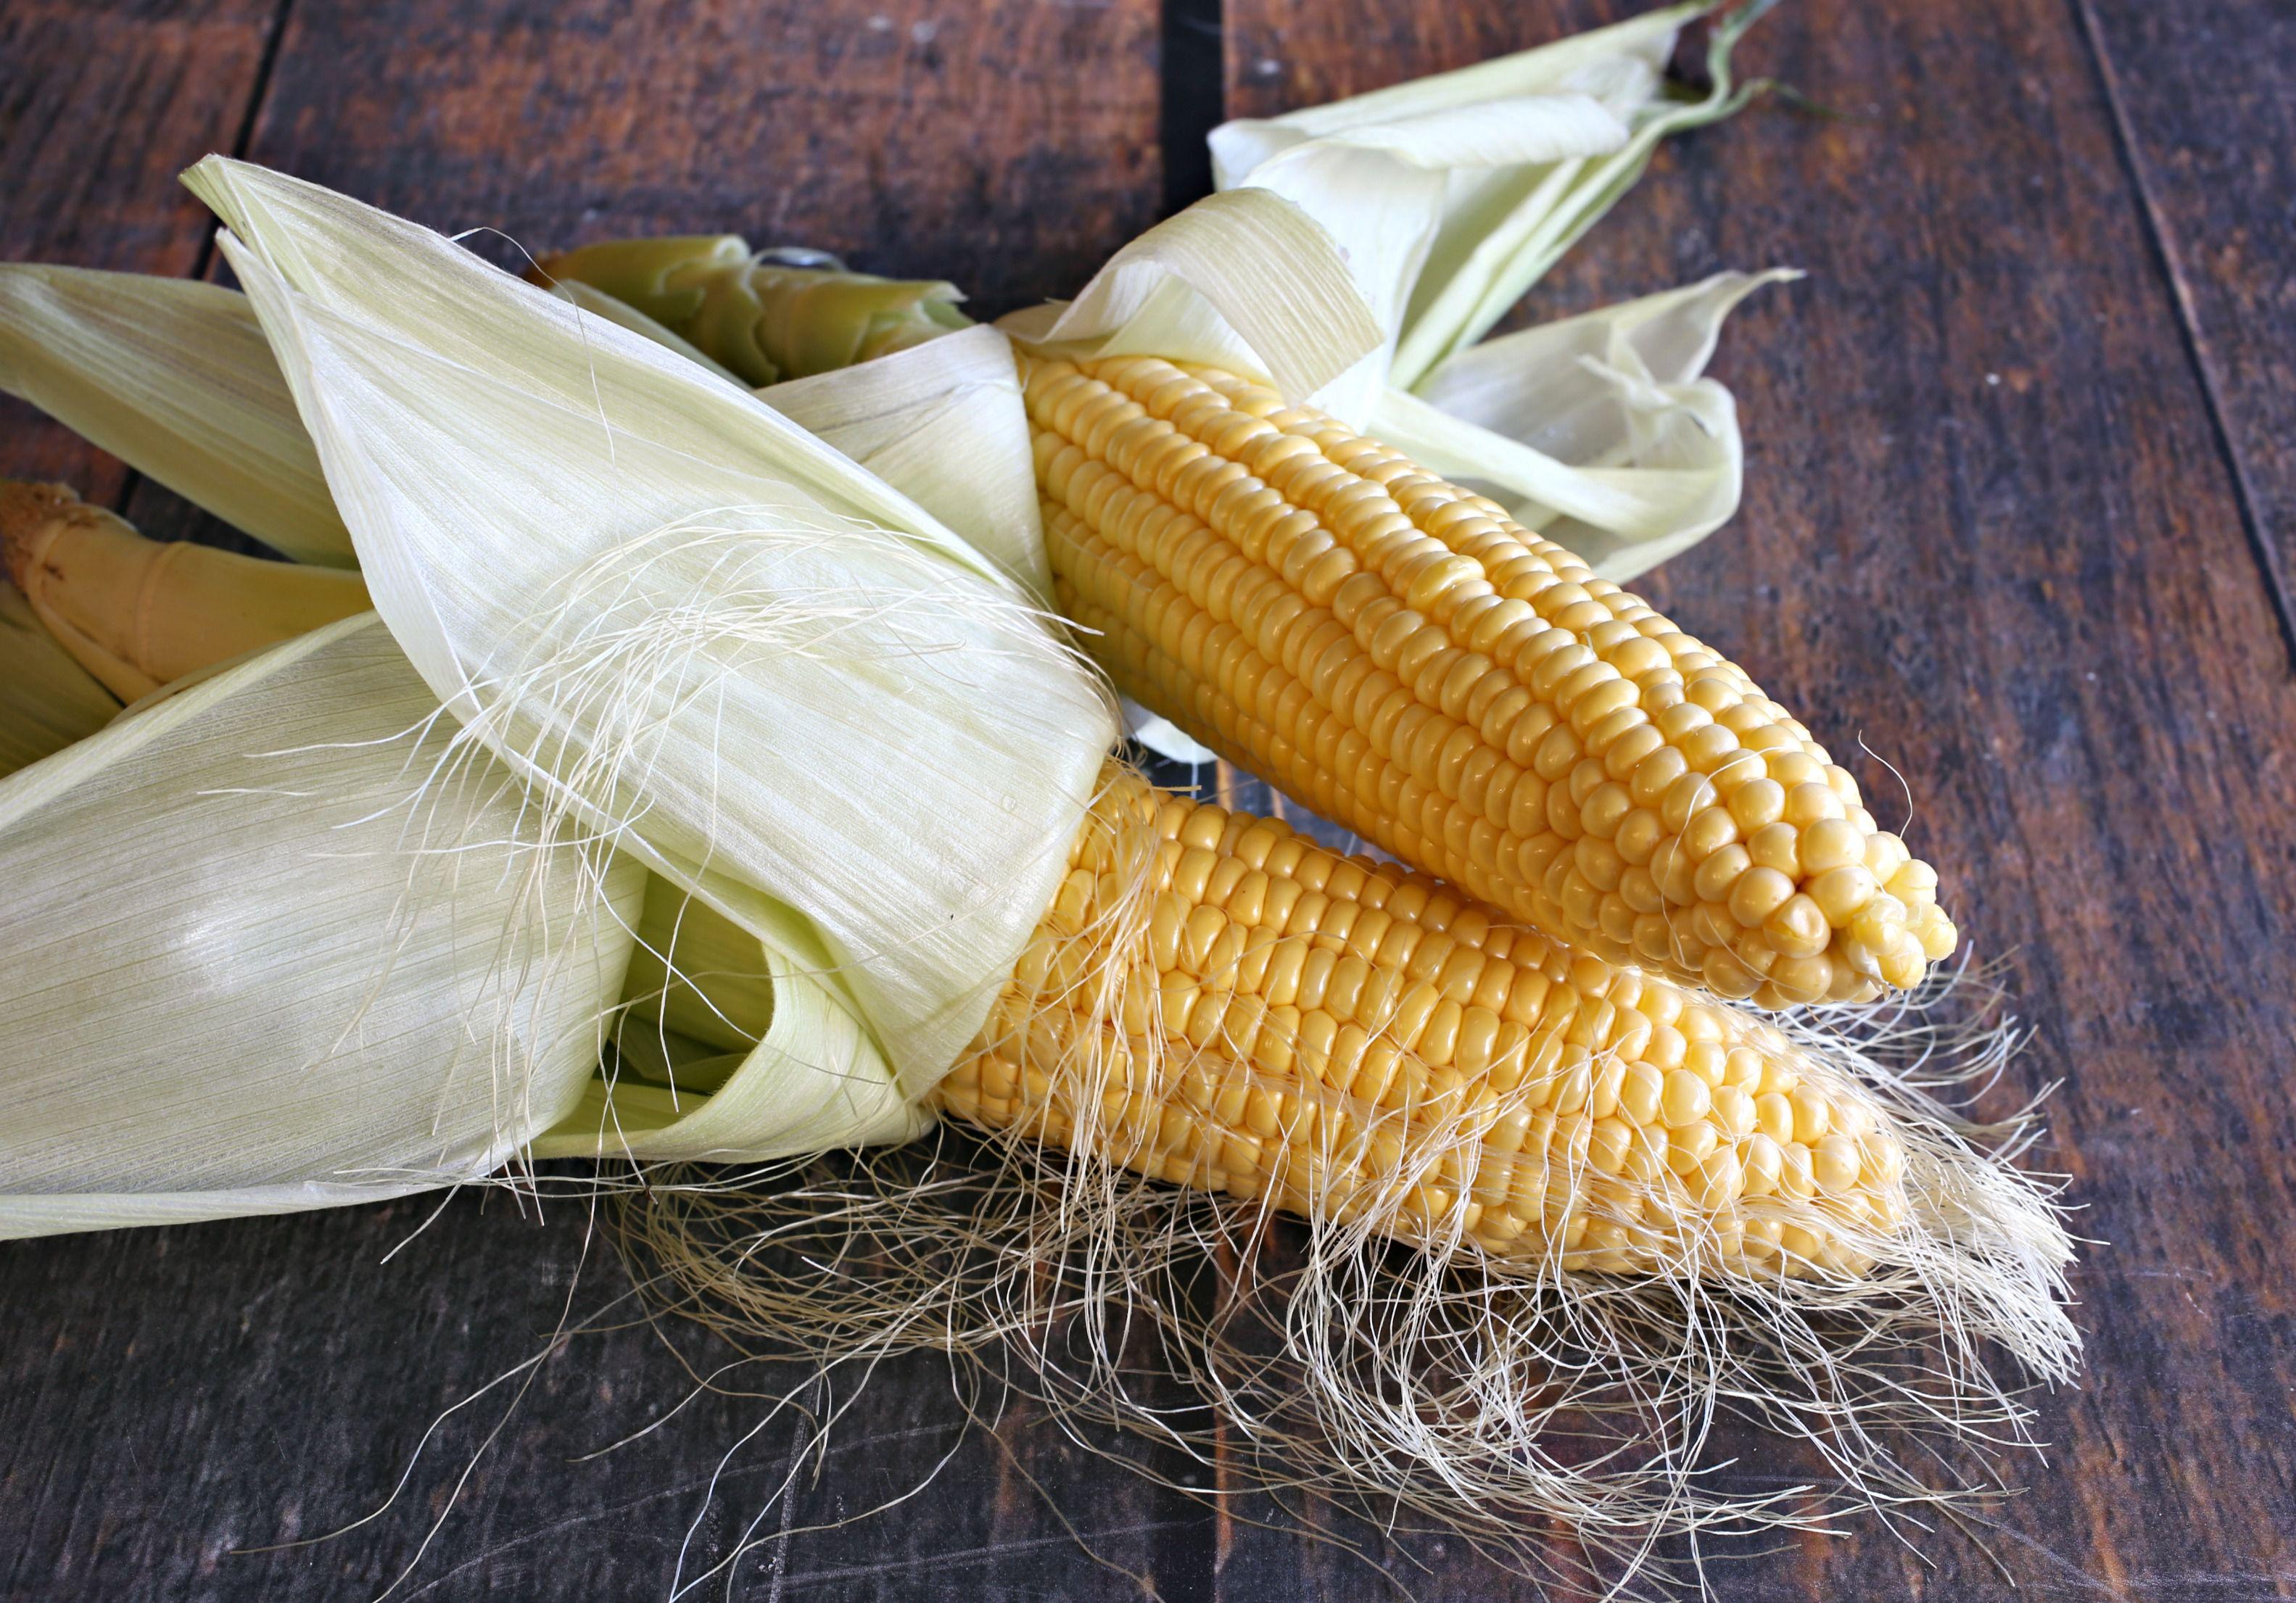 Removing corn husks